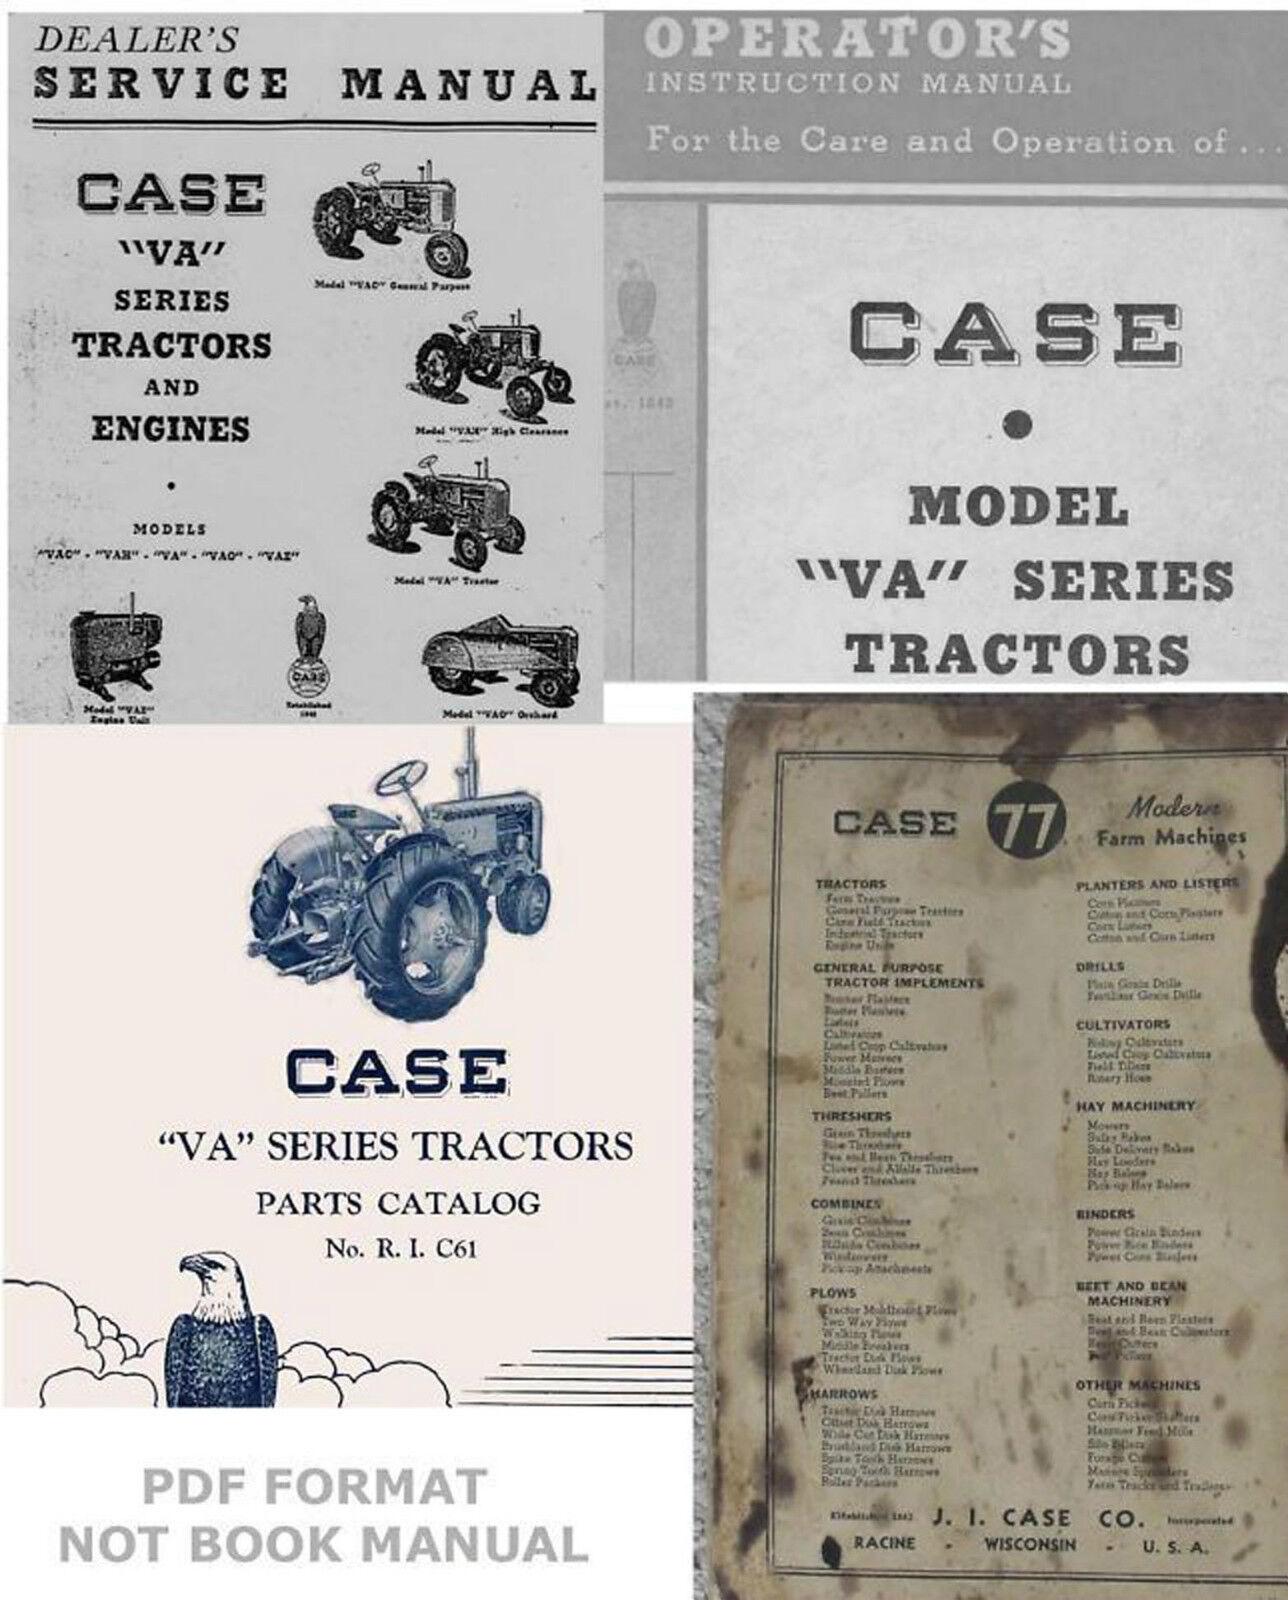 4 manuals case va vac vao vae vah tractors service operator s parts rh ebay com 1944 Case VAC Tractor 1947 Case VAC Tractor